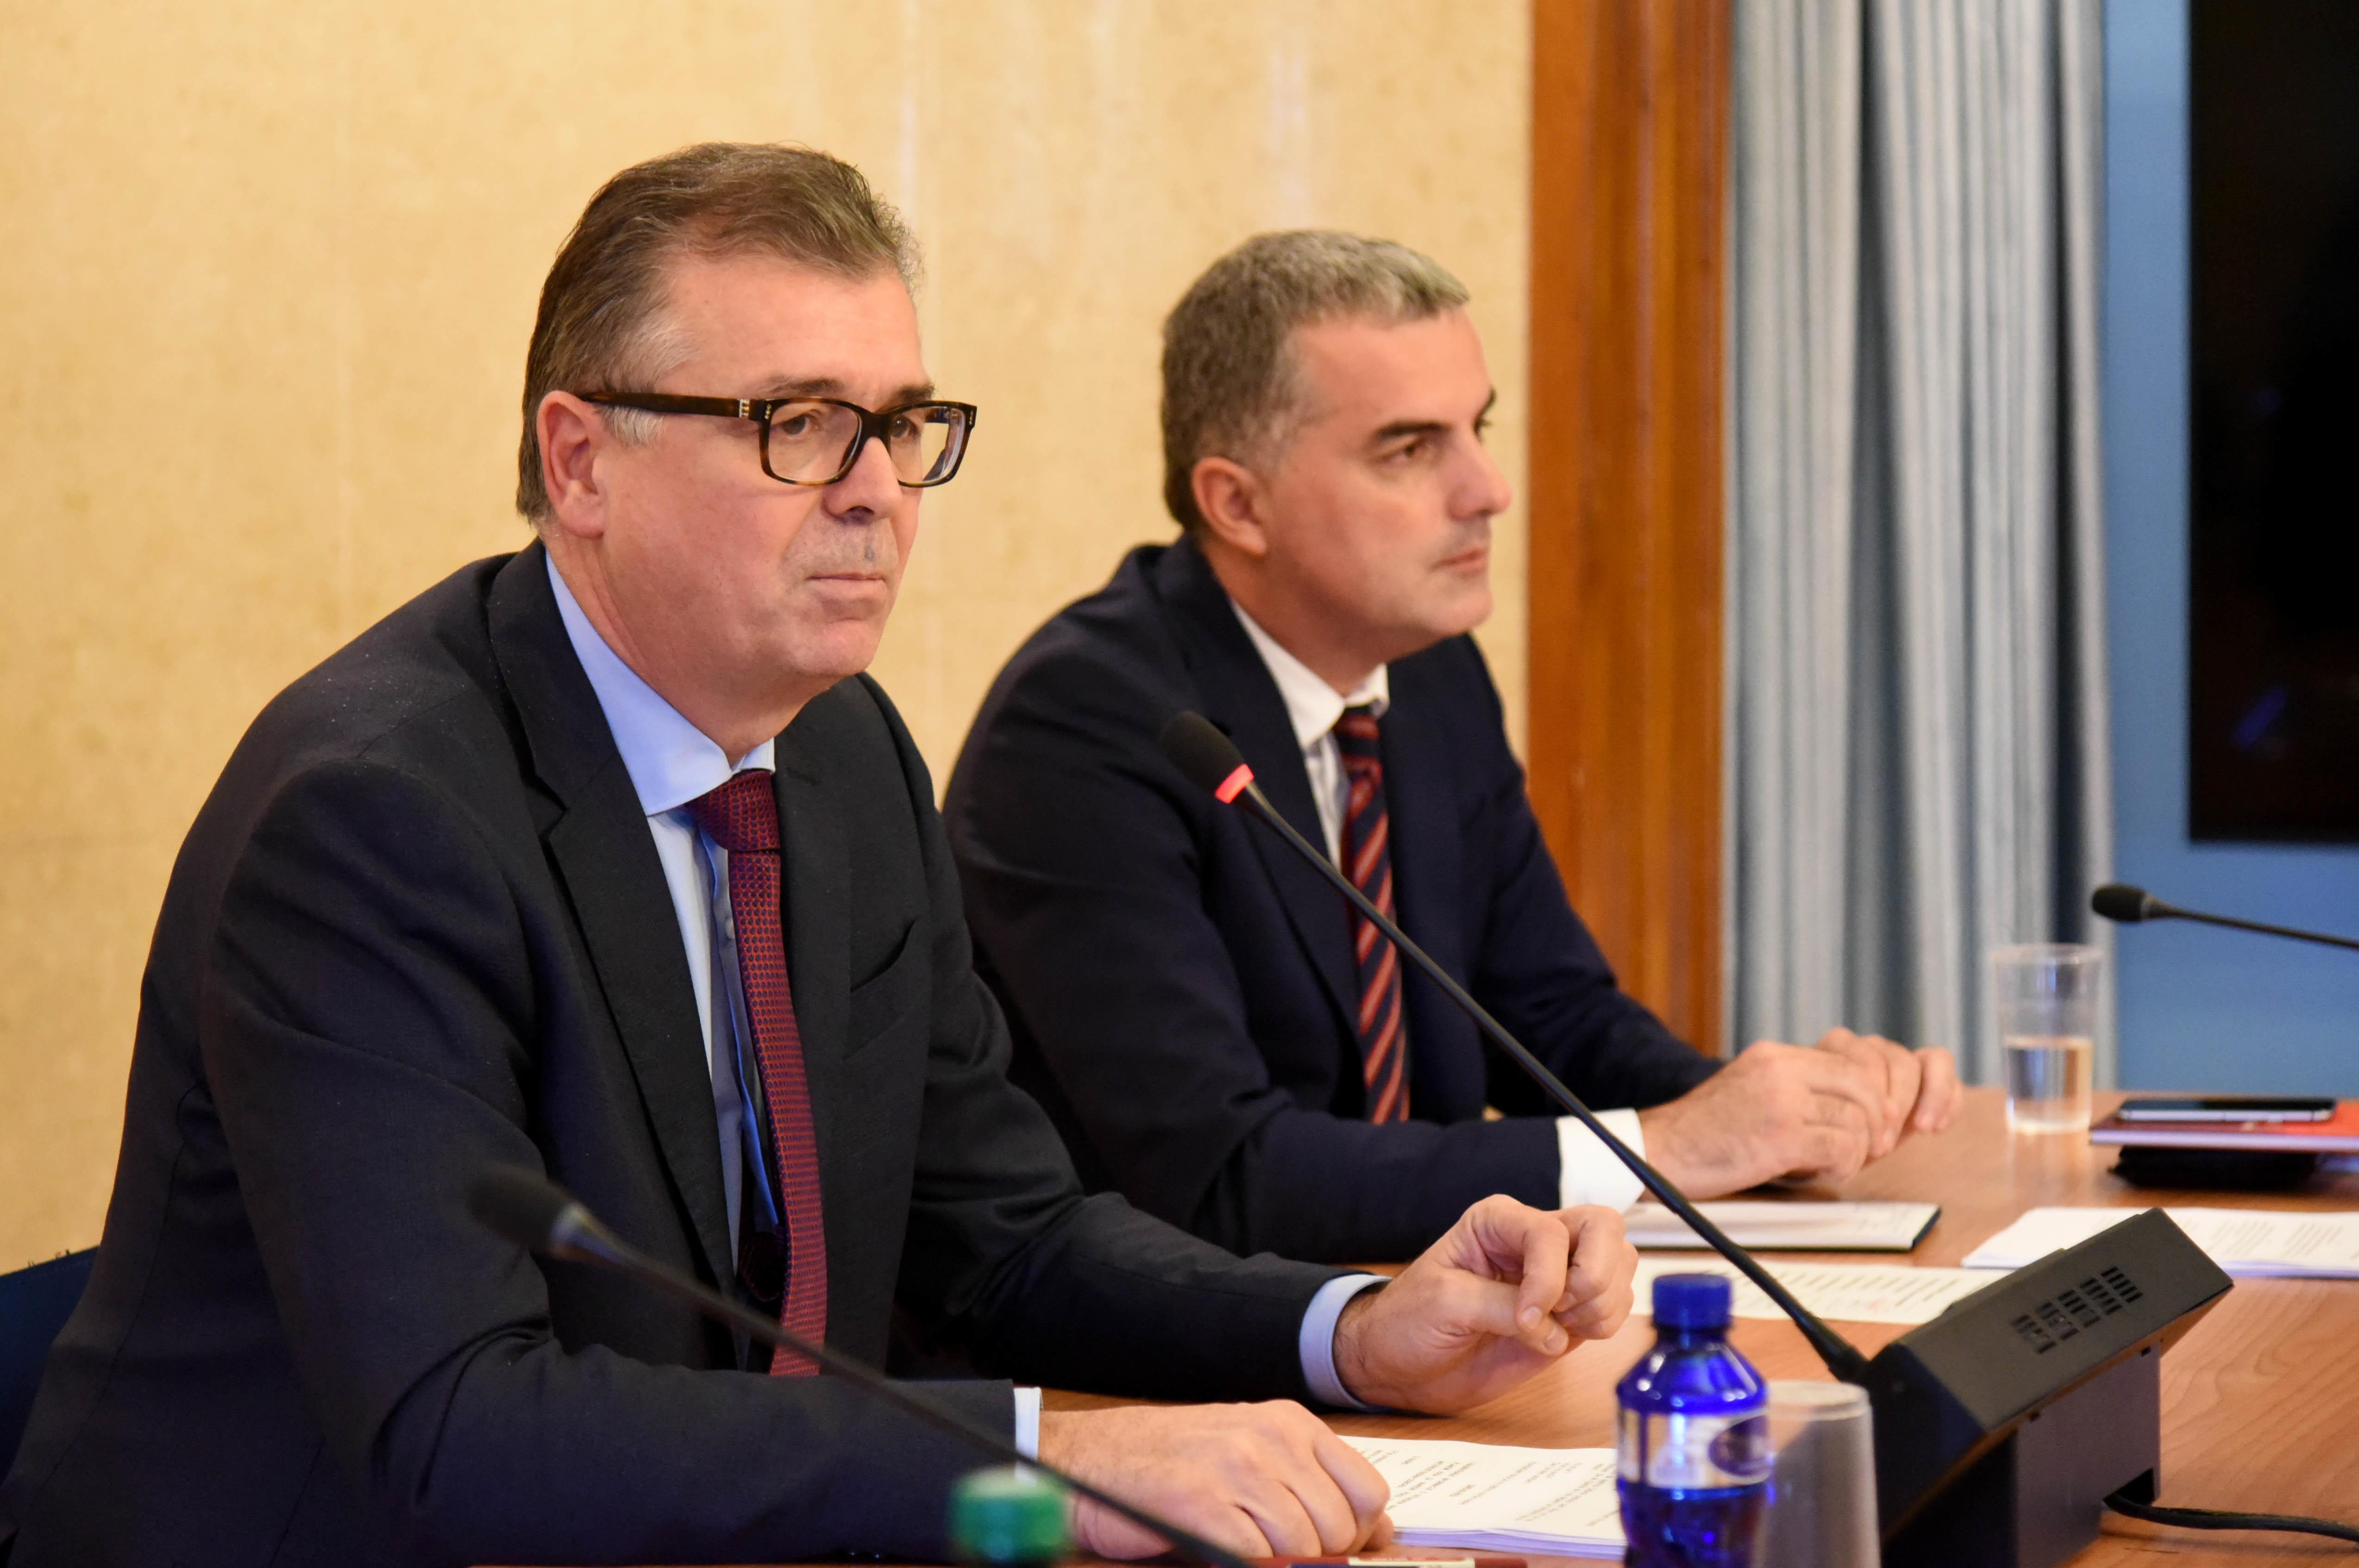 Predloge spremiti do kraja prve sedmice decembra: Sjednica odbora